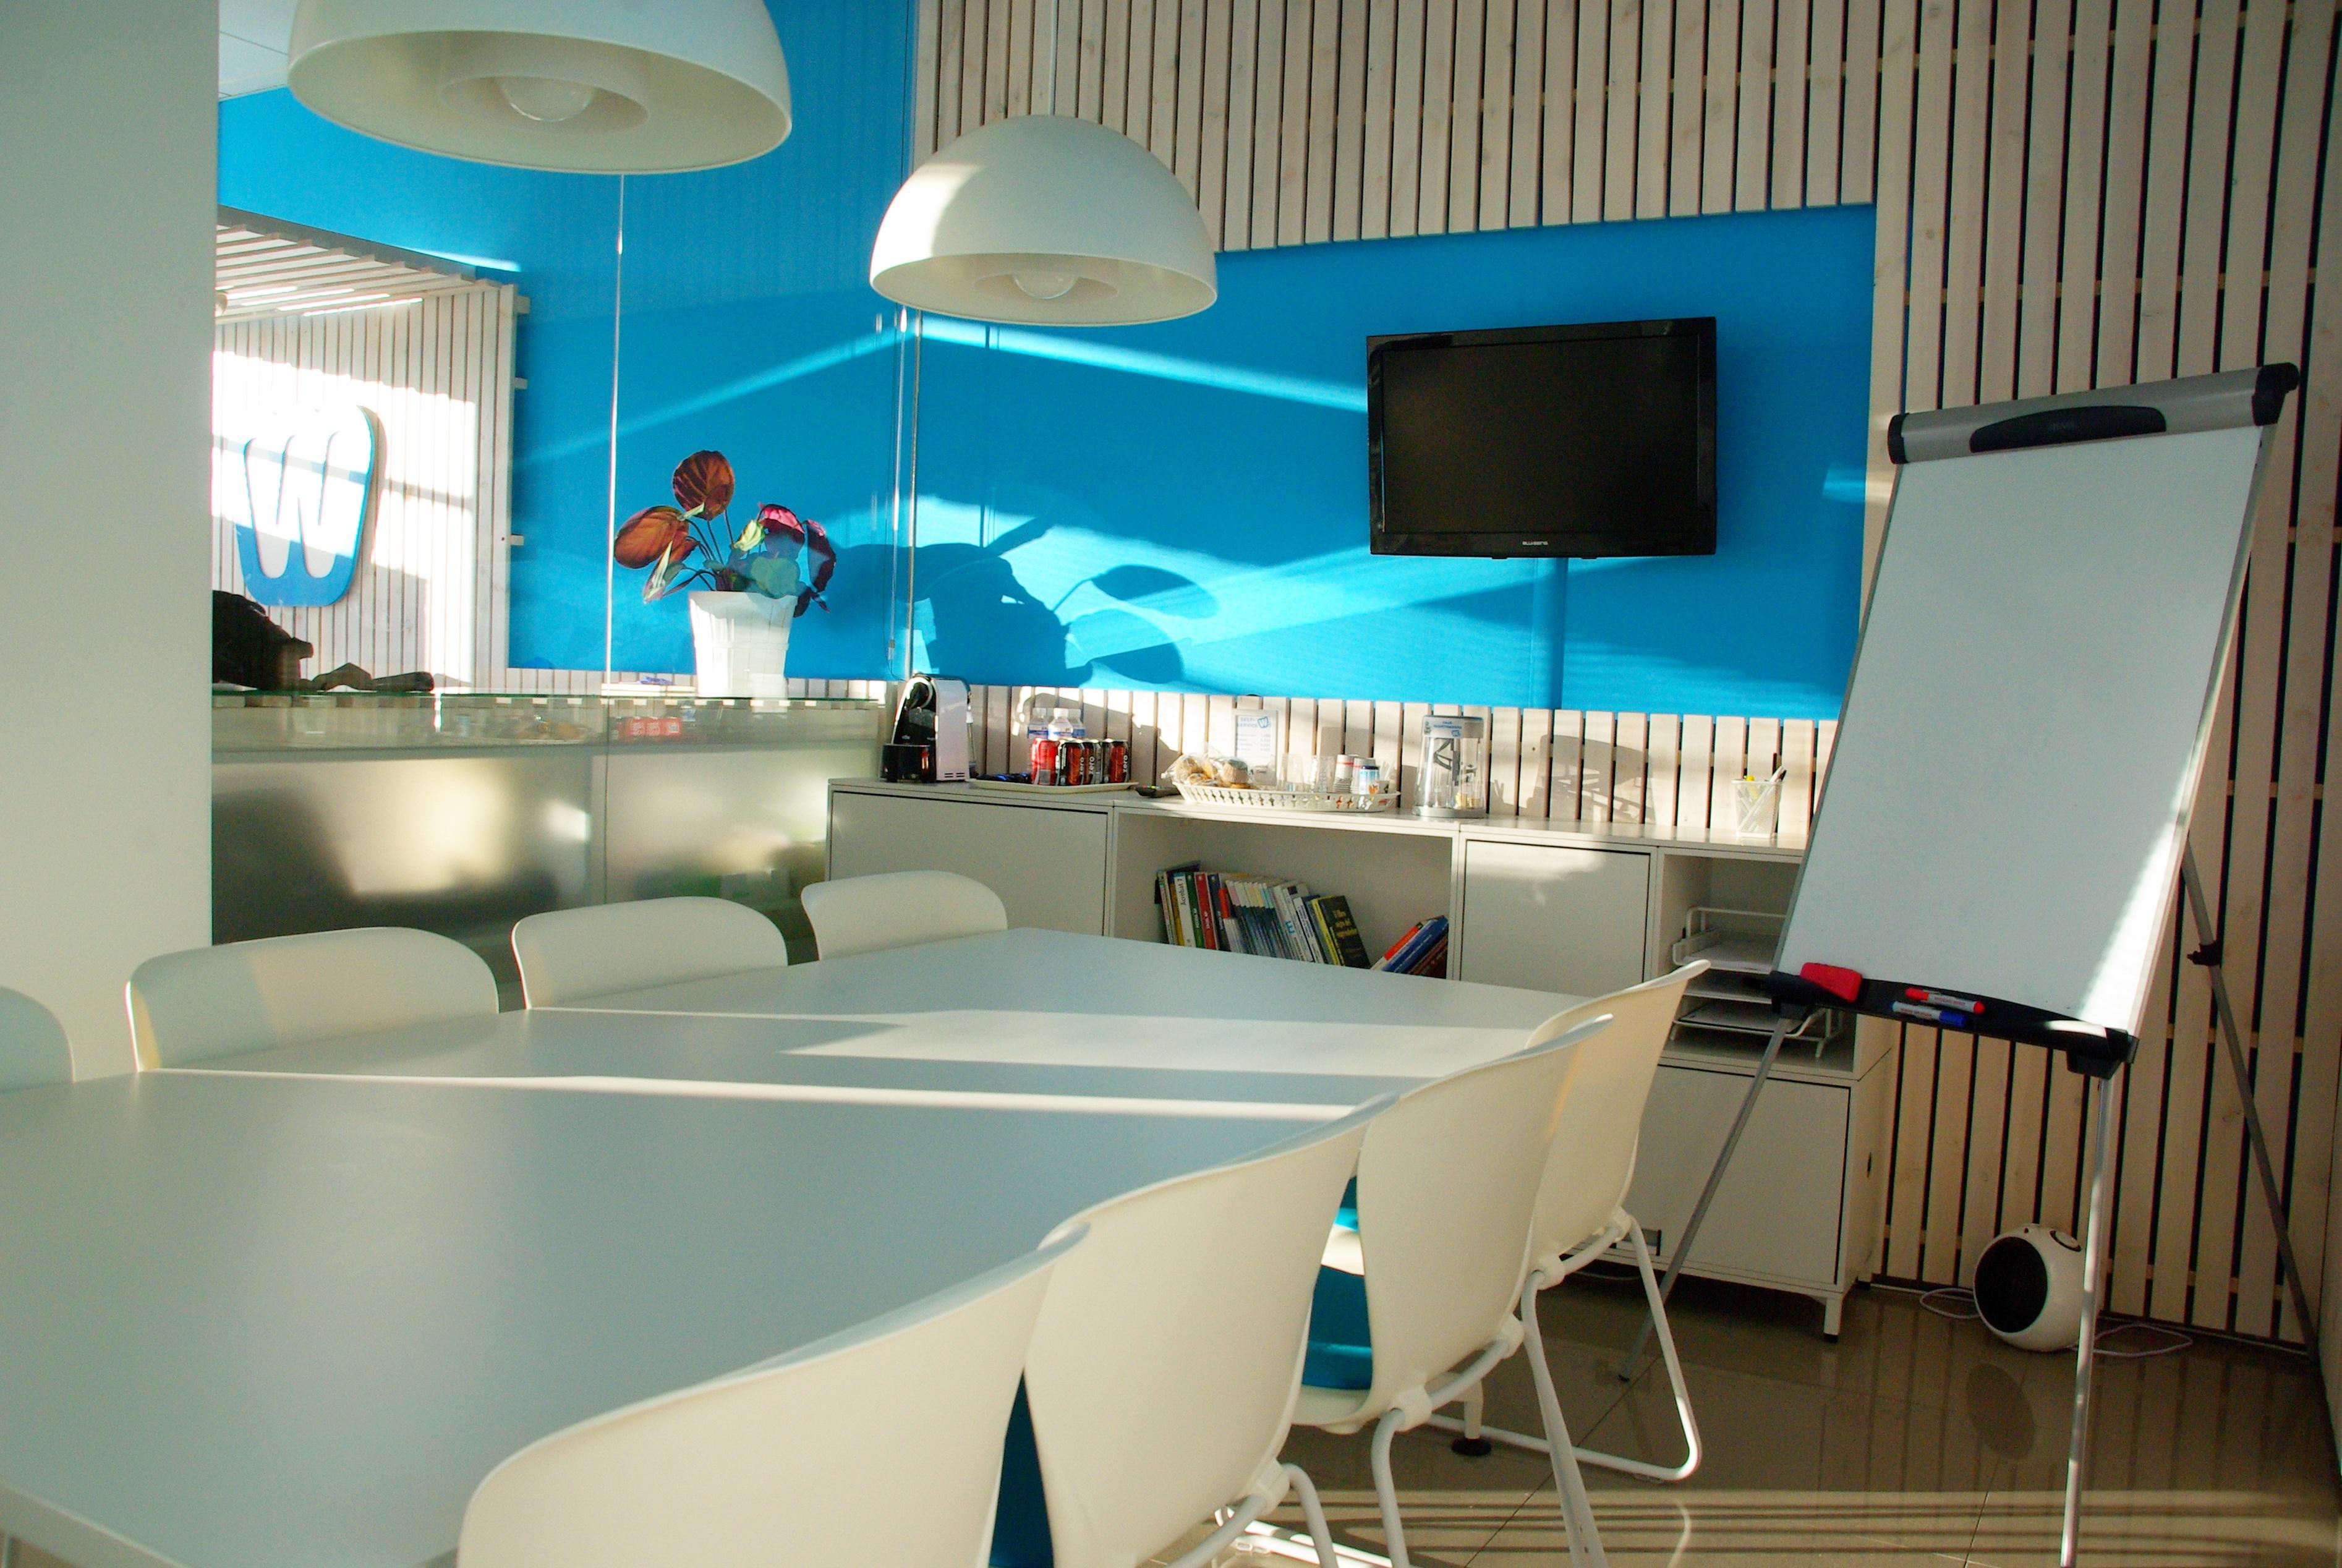 Free images : desk table light wood floor seat window ceiling